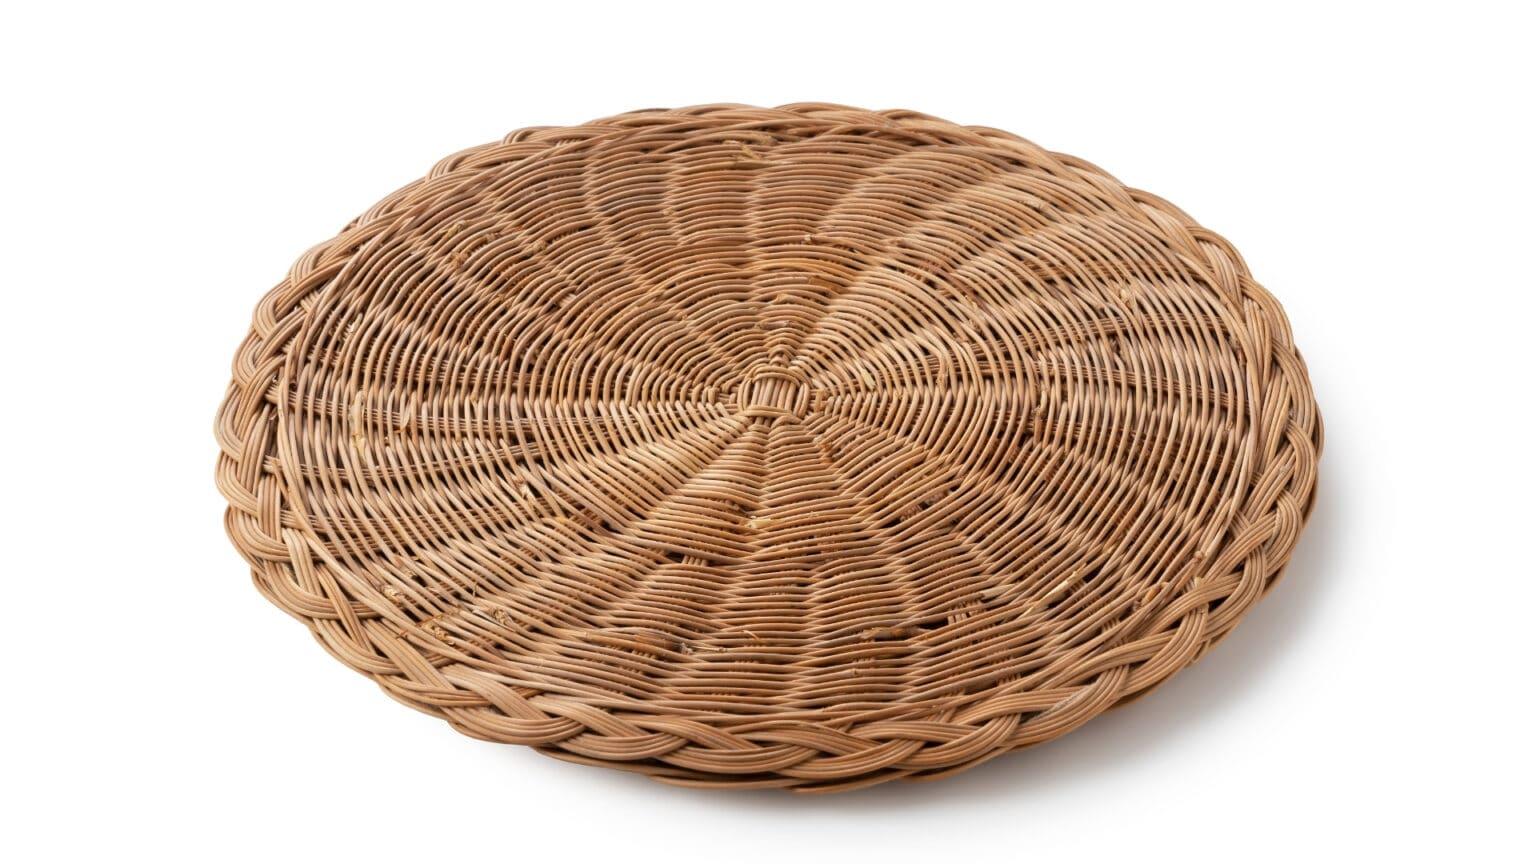 Alternatives to Wood